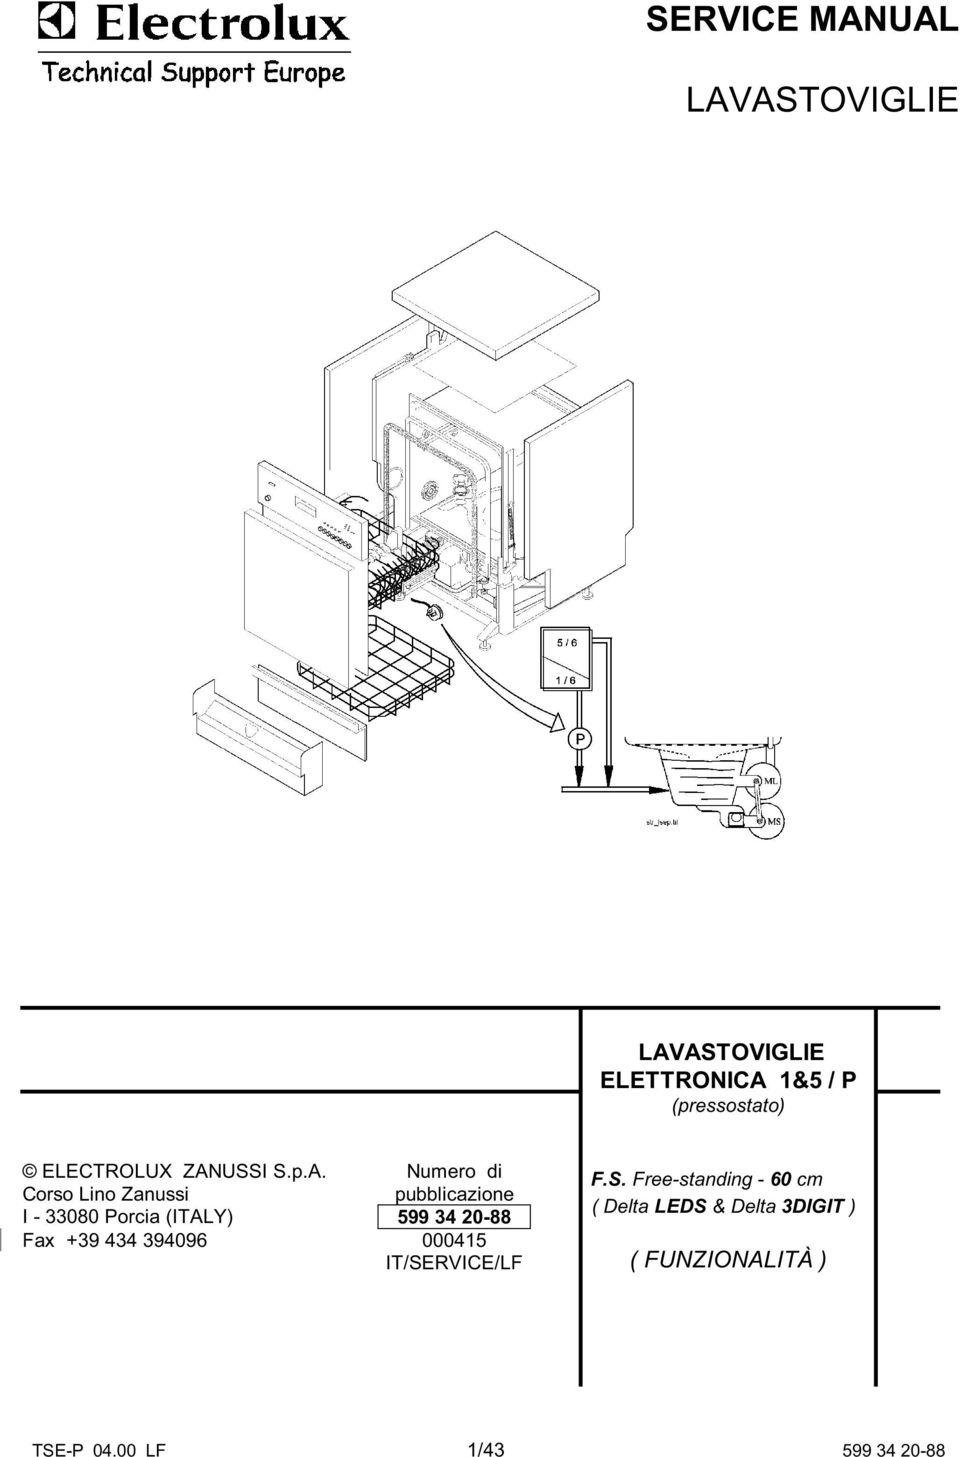 SERVICE MANUAL LAVASTOVIGLIE LAVASTOVIGLIE ELETTRONICA 1&5